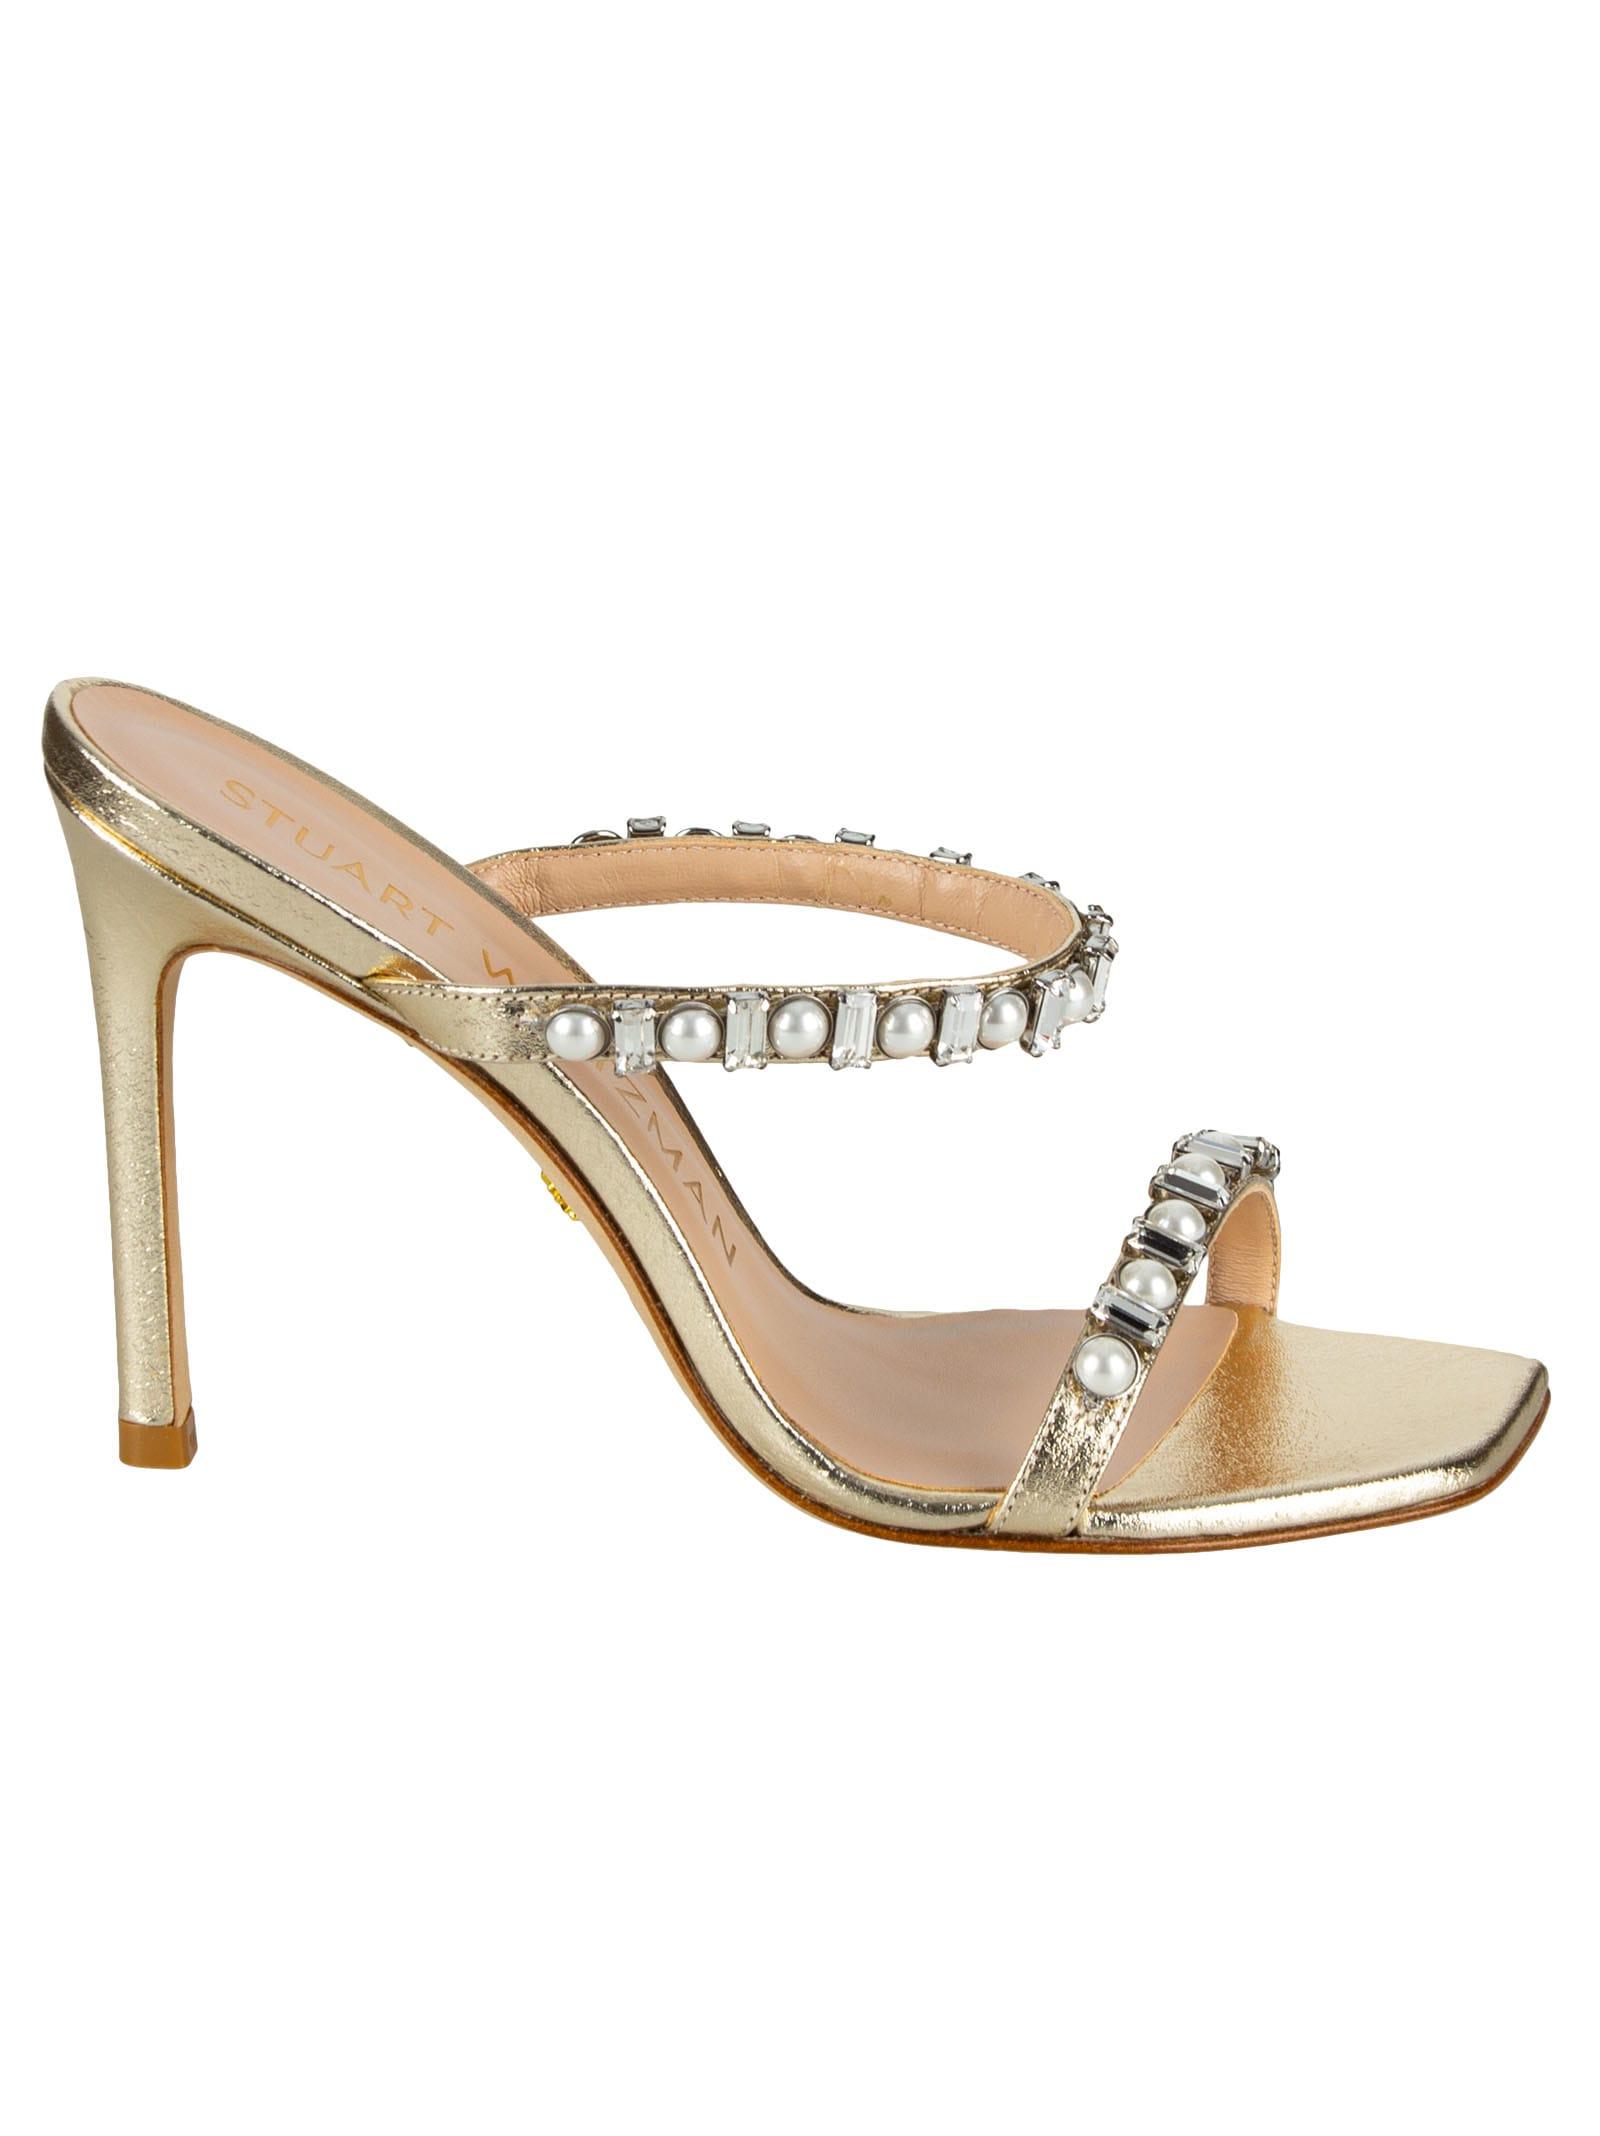 Buy Stuart Weitzman Aleena Shine Sandals online, shop Stuart Weitzman shoes with free shipping